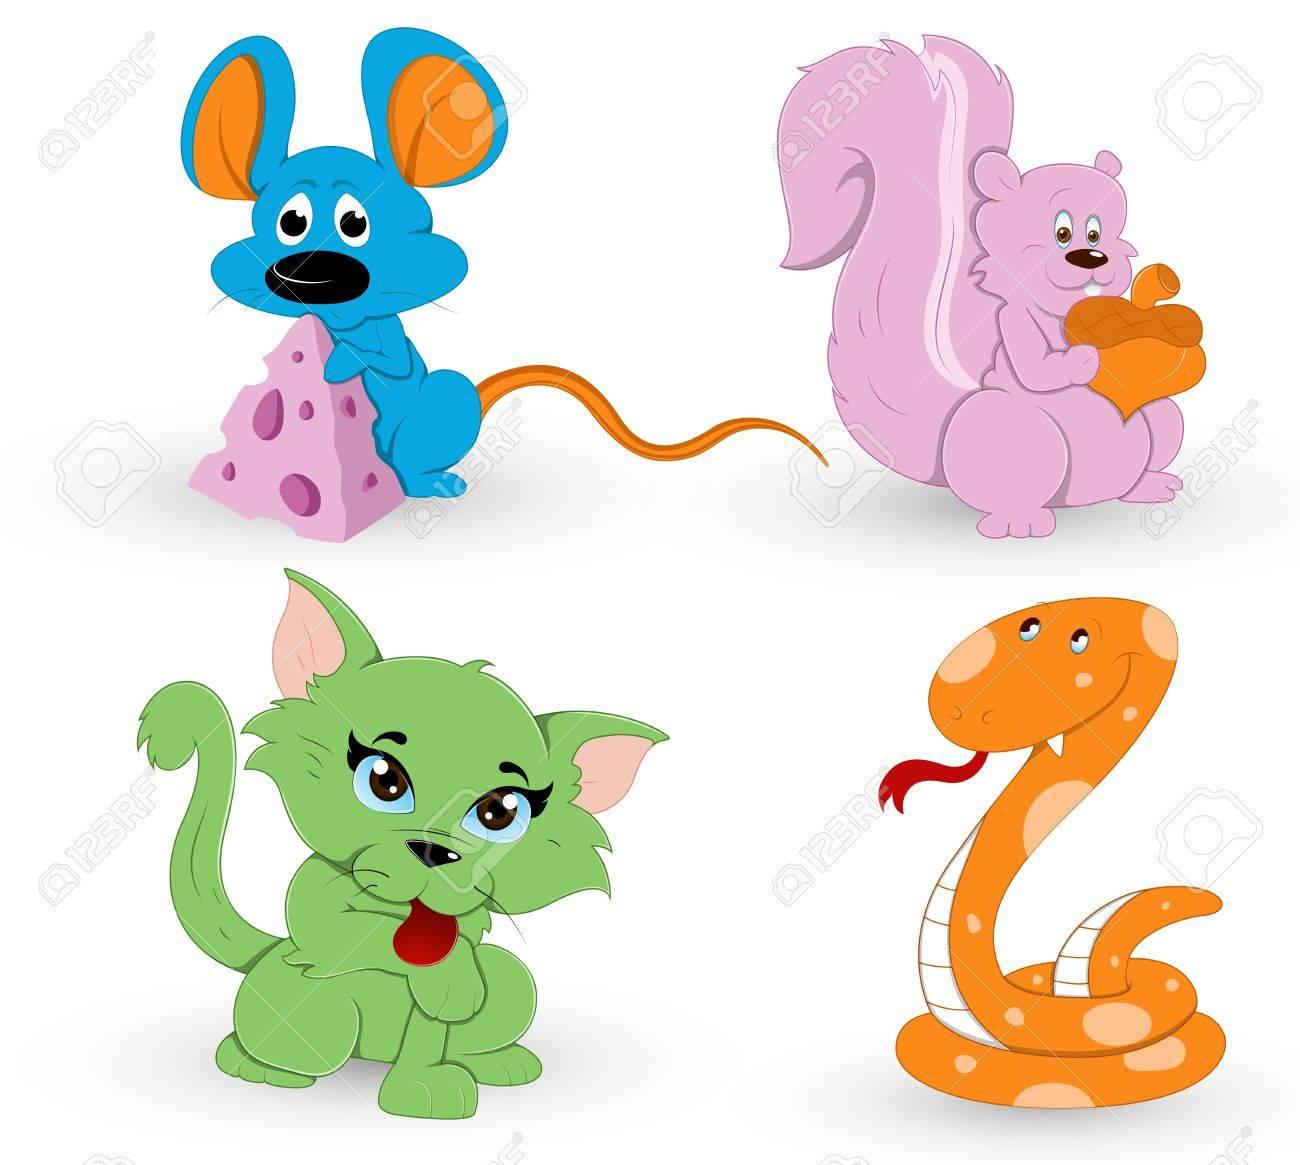 Cute Cartoon Animals Stock Vector - 13358209